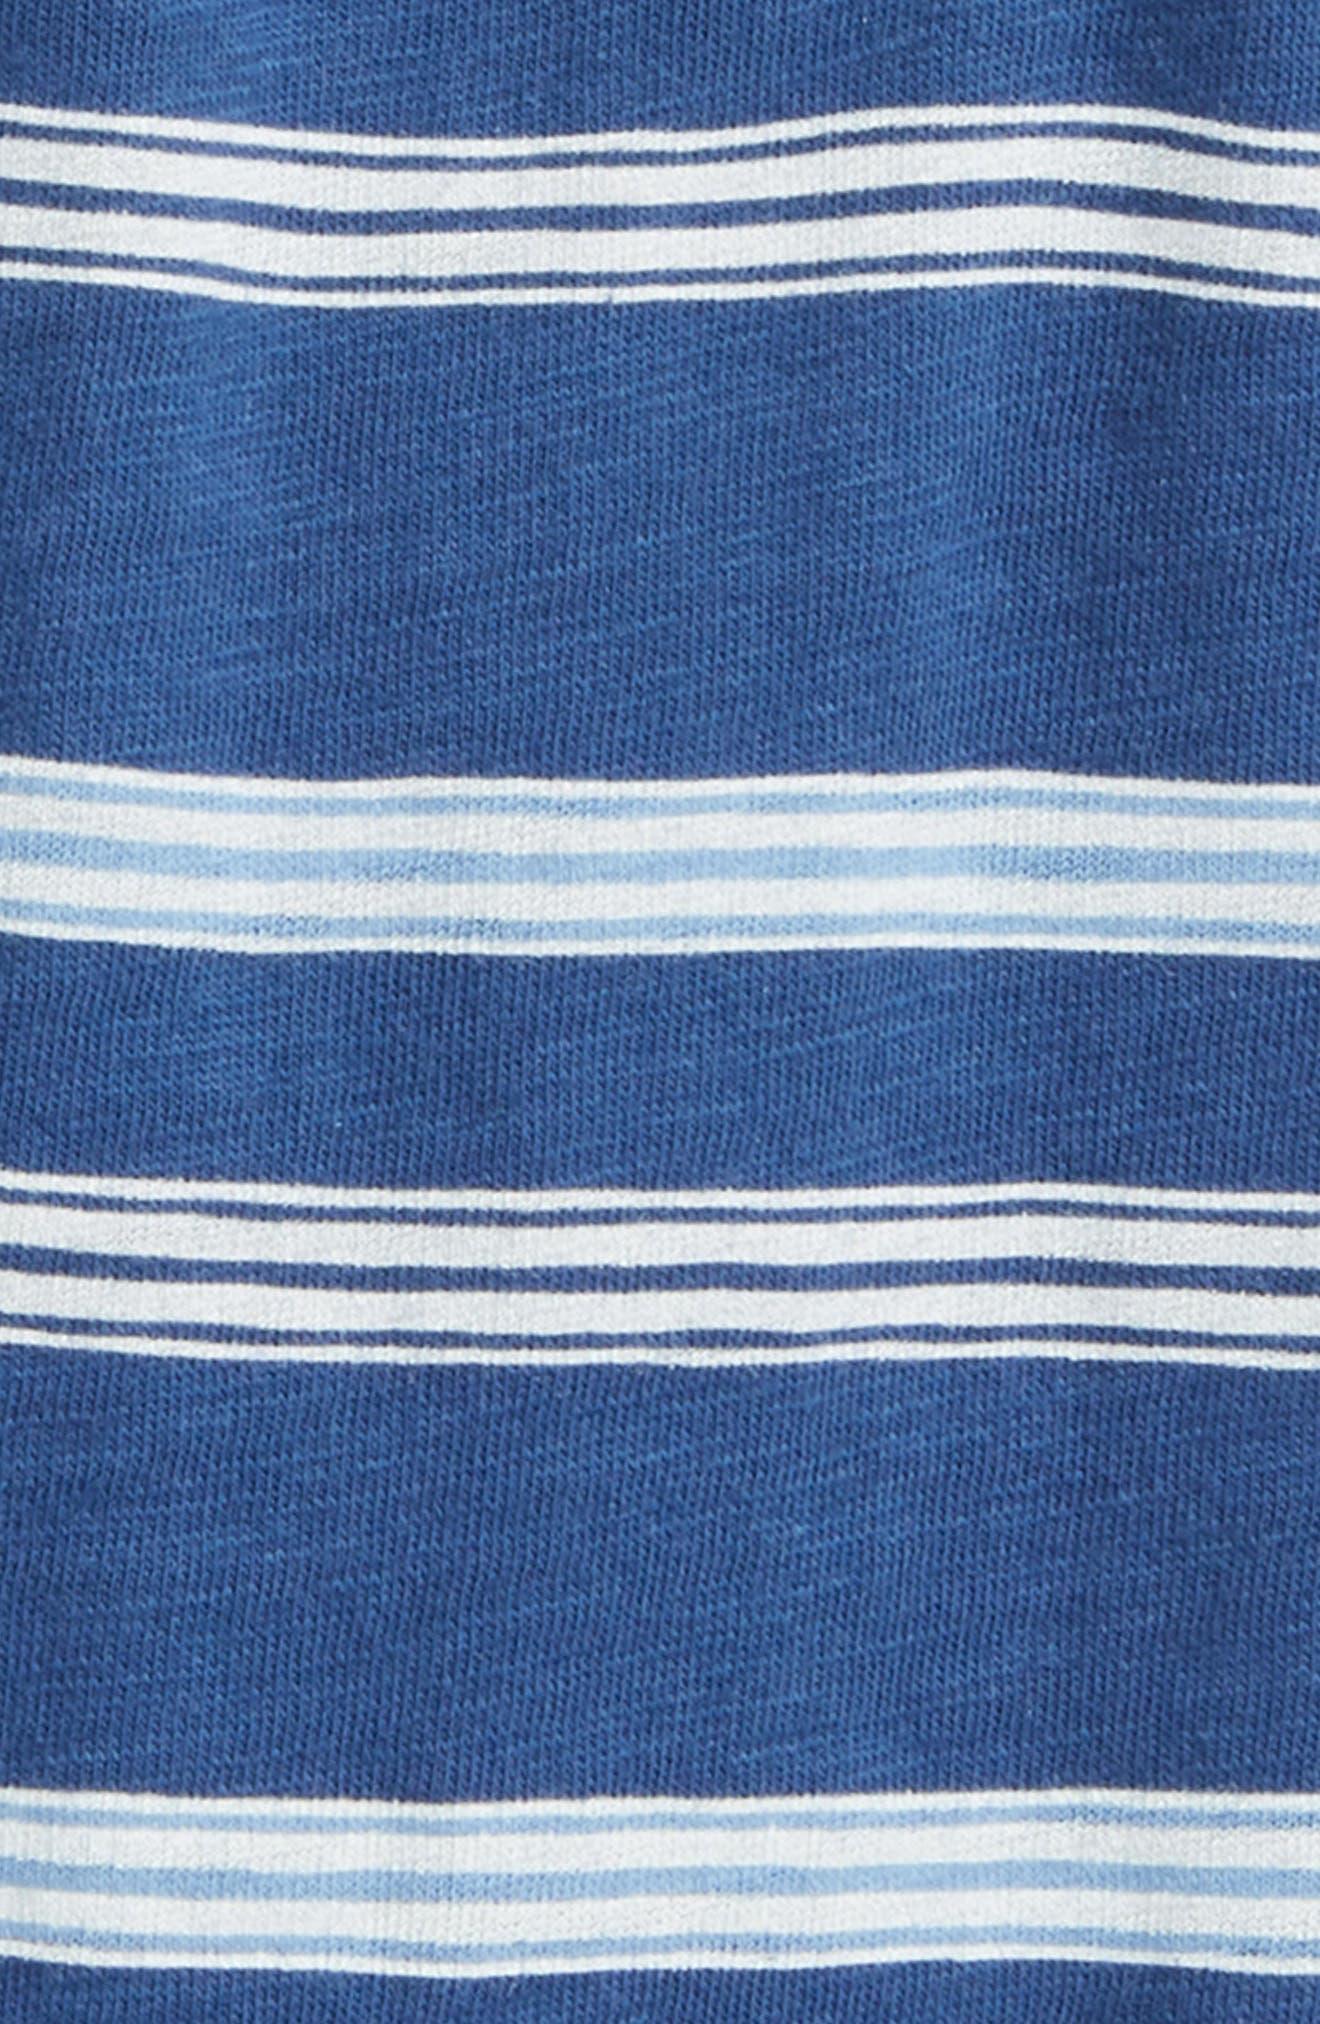 Peek Kaylan Stripe Pants,                             Alternate thumbnail 2, color,                             400